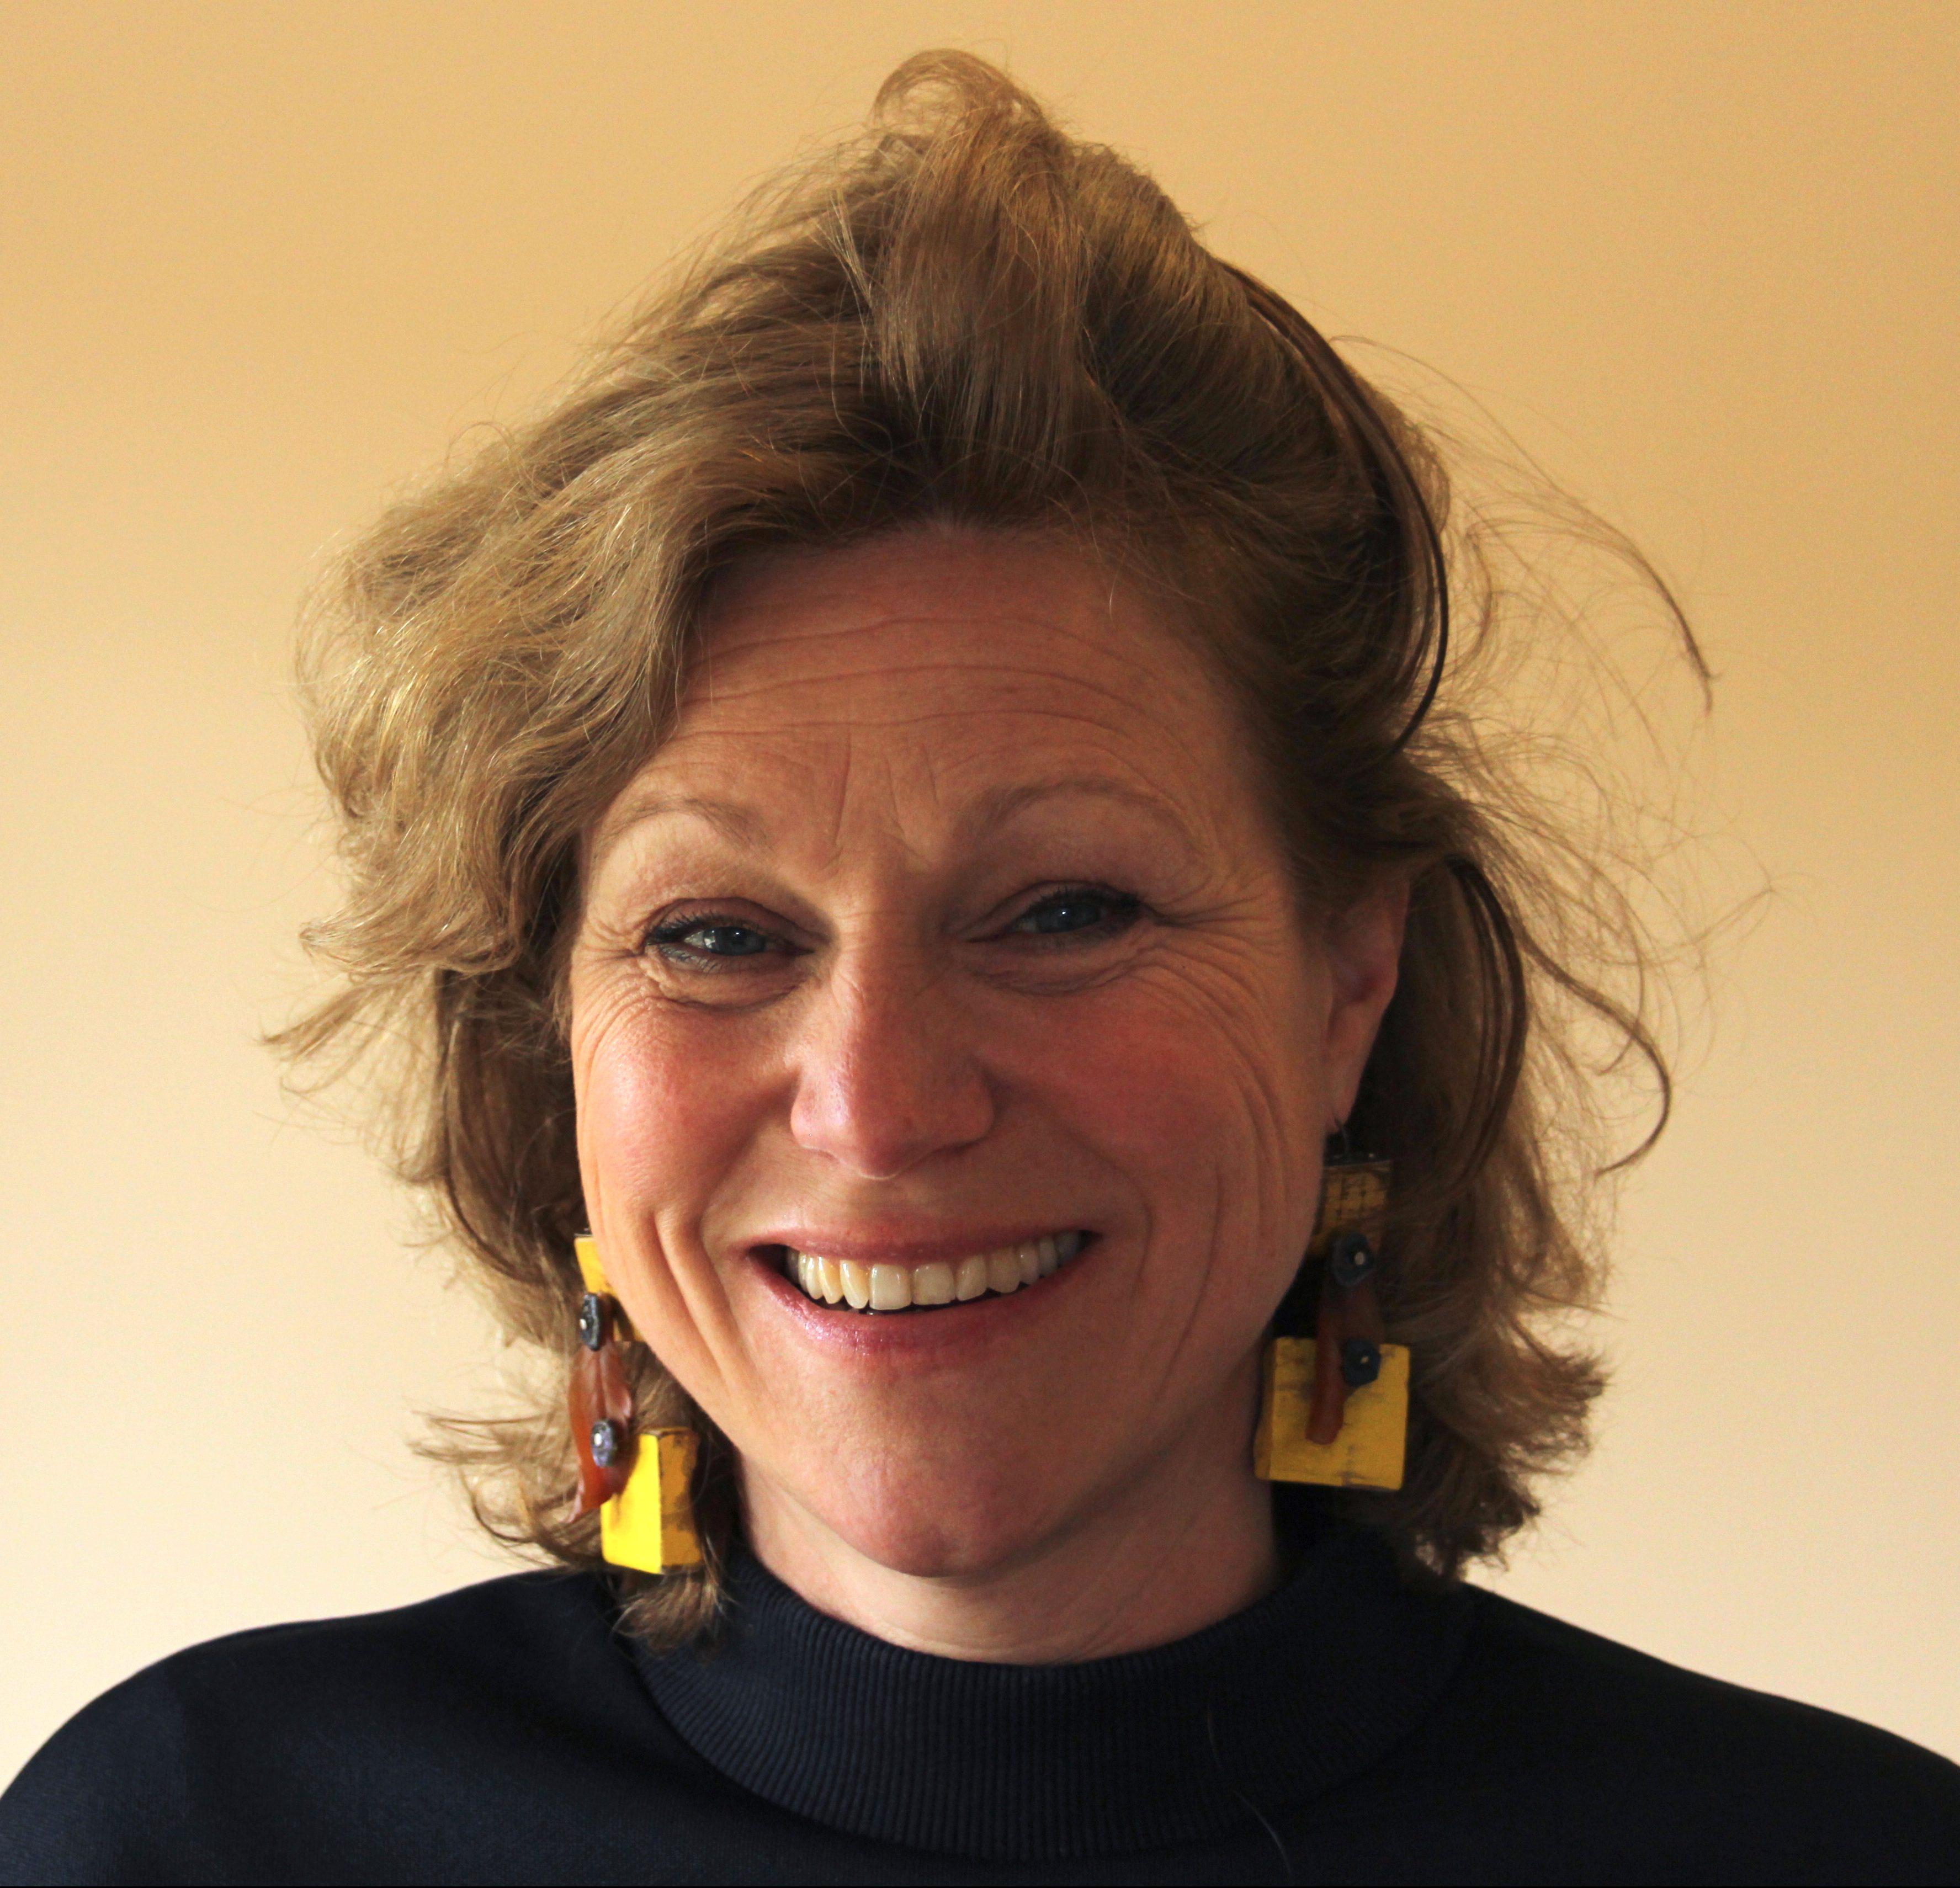 Saskia van Es draagt oorsieraden van Tatjana Giorgadse, 2018. Foto Saskia van Es, hout, agaat, zilver, linoleum